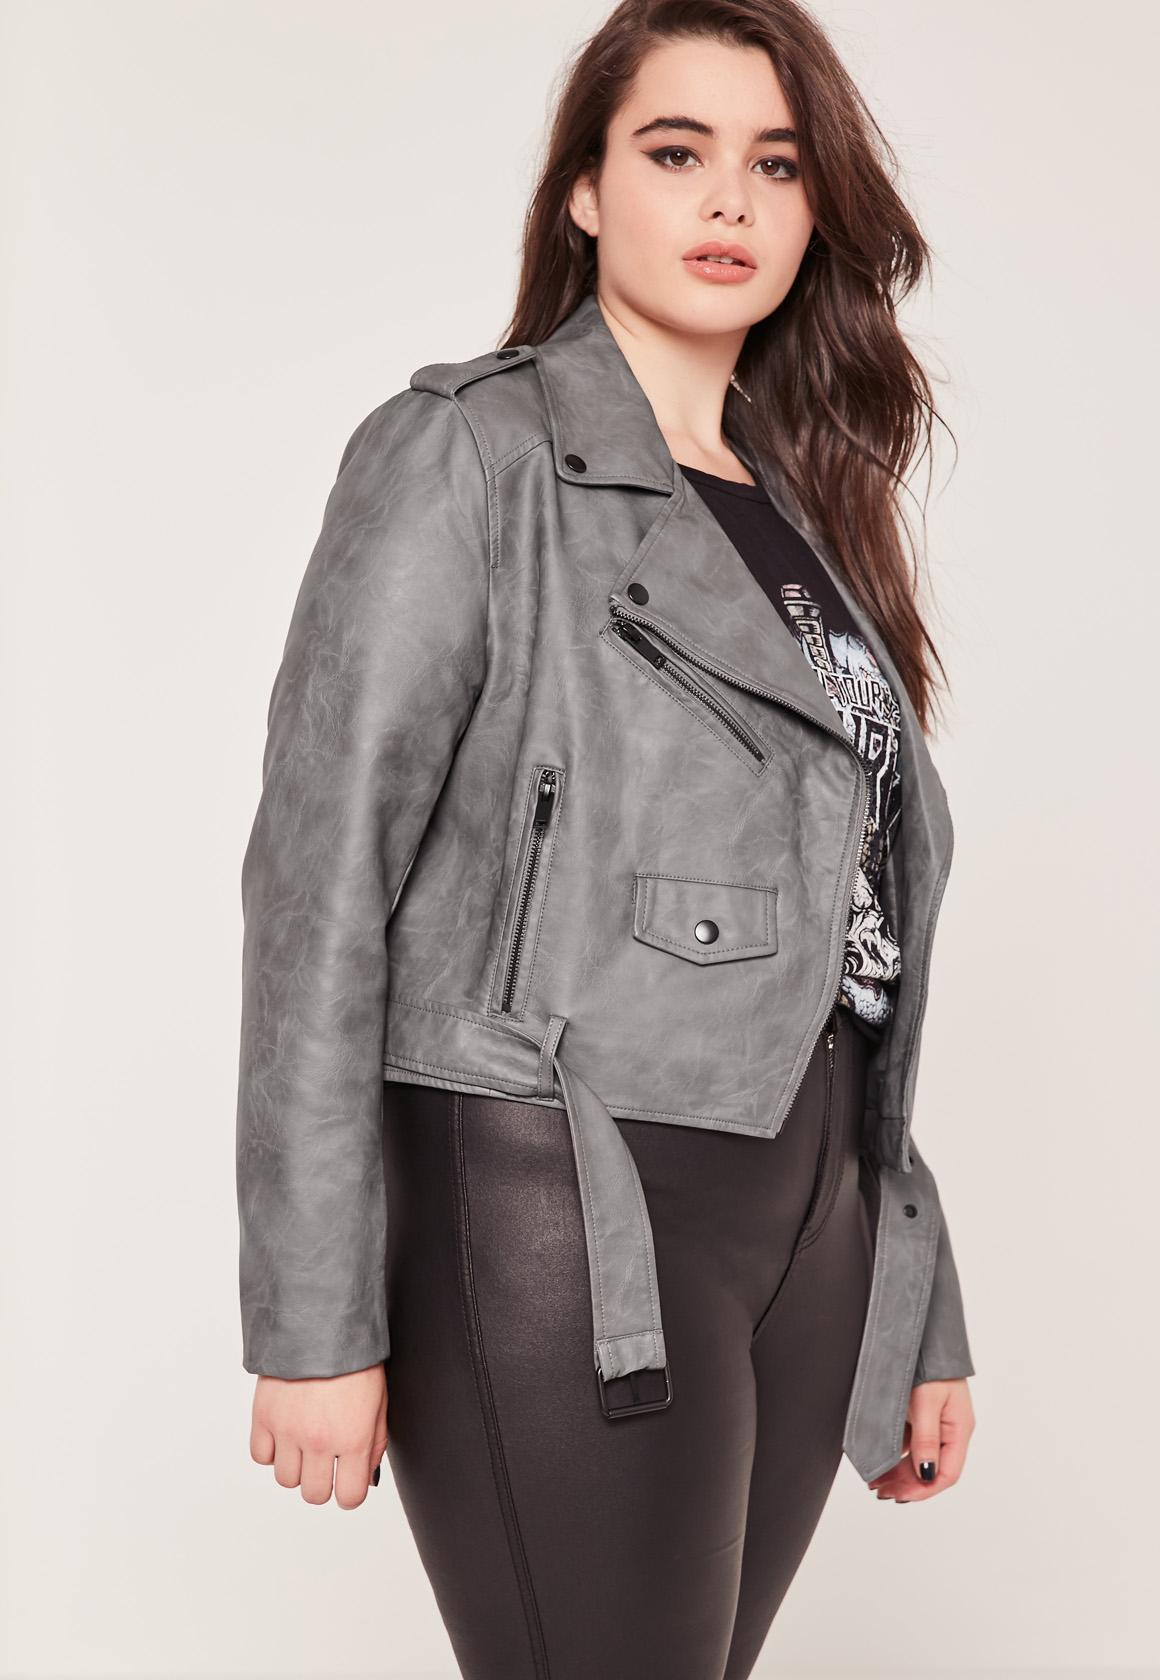 Plus Size Faux Leather Motorcycle Jacket - Cairoamani.com